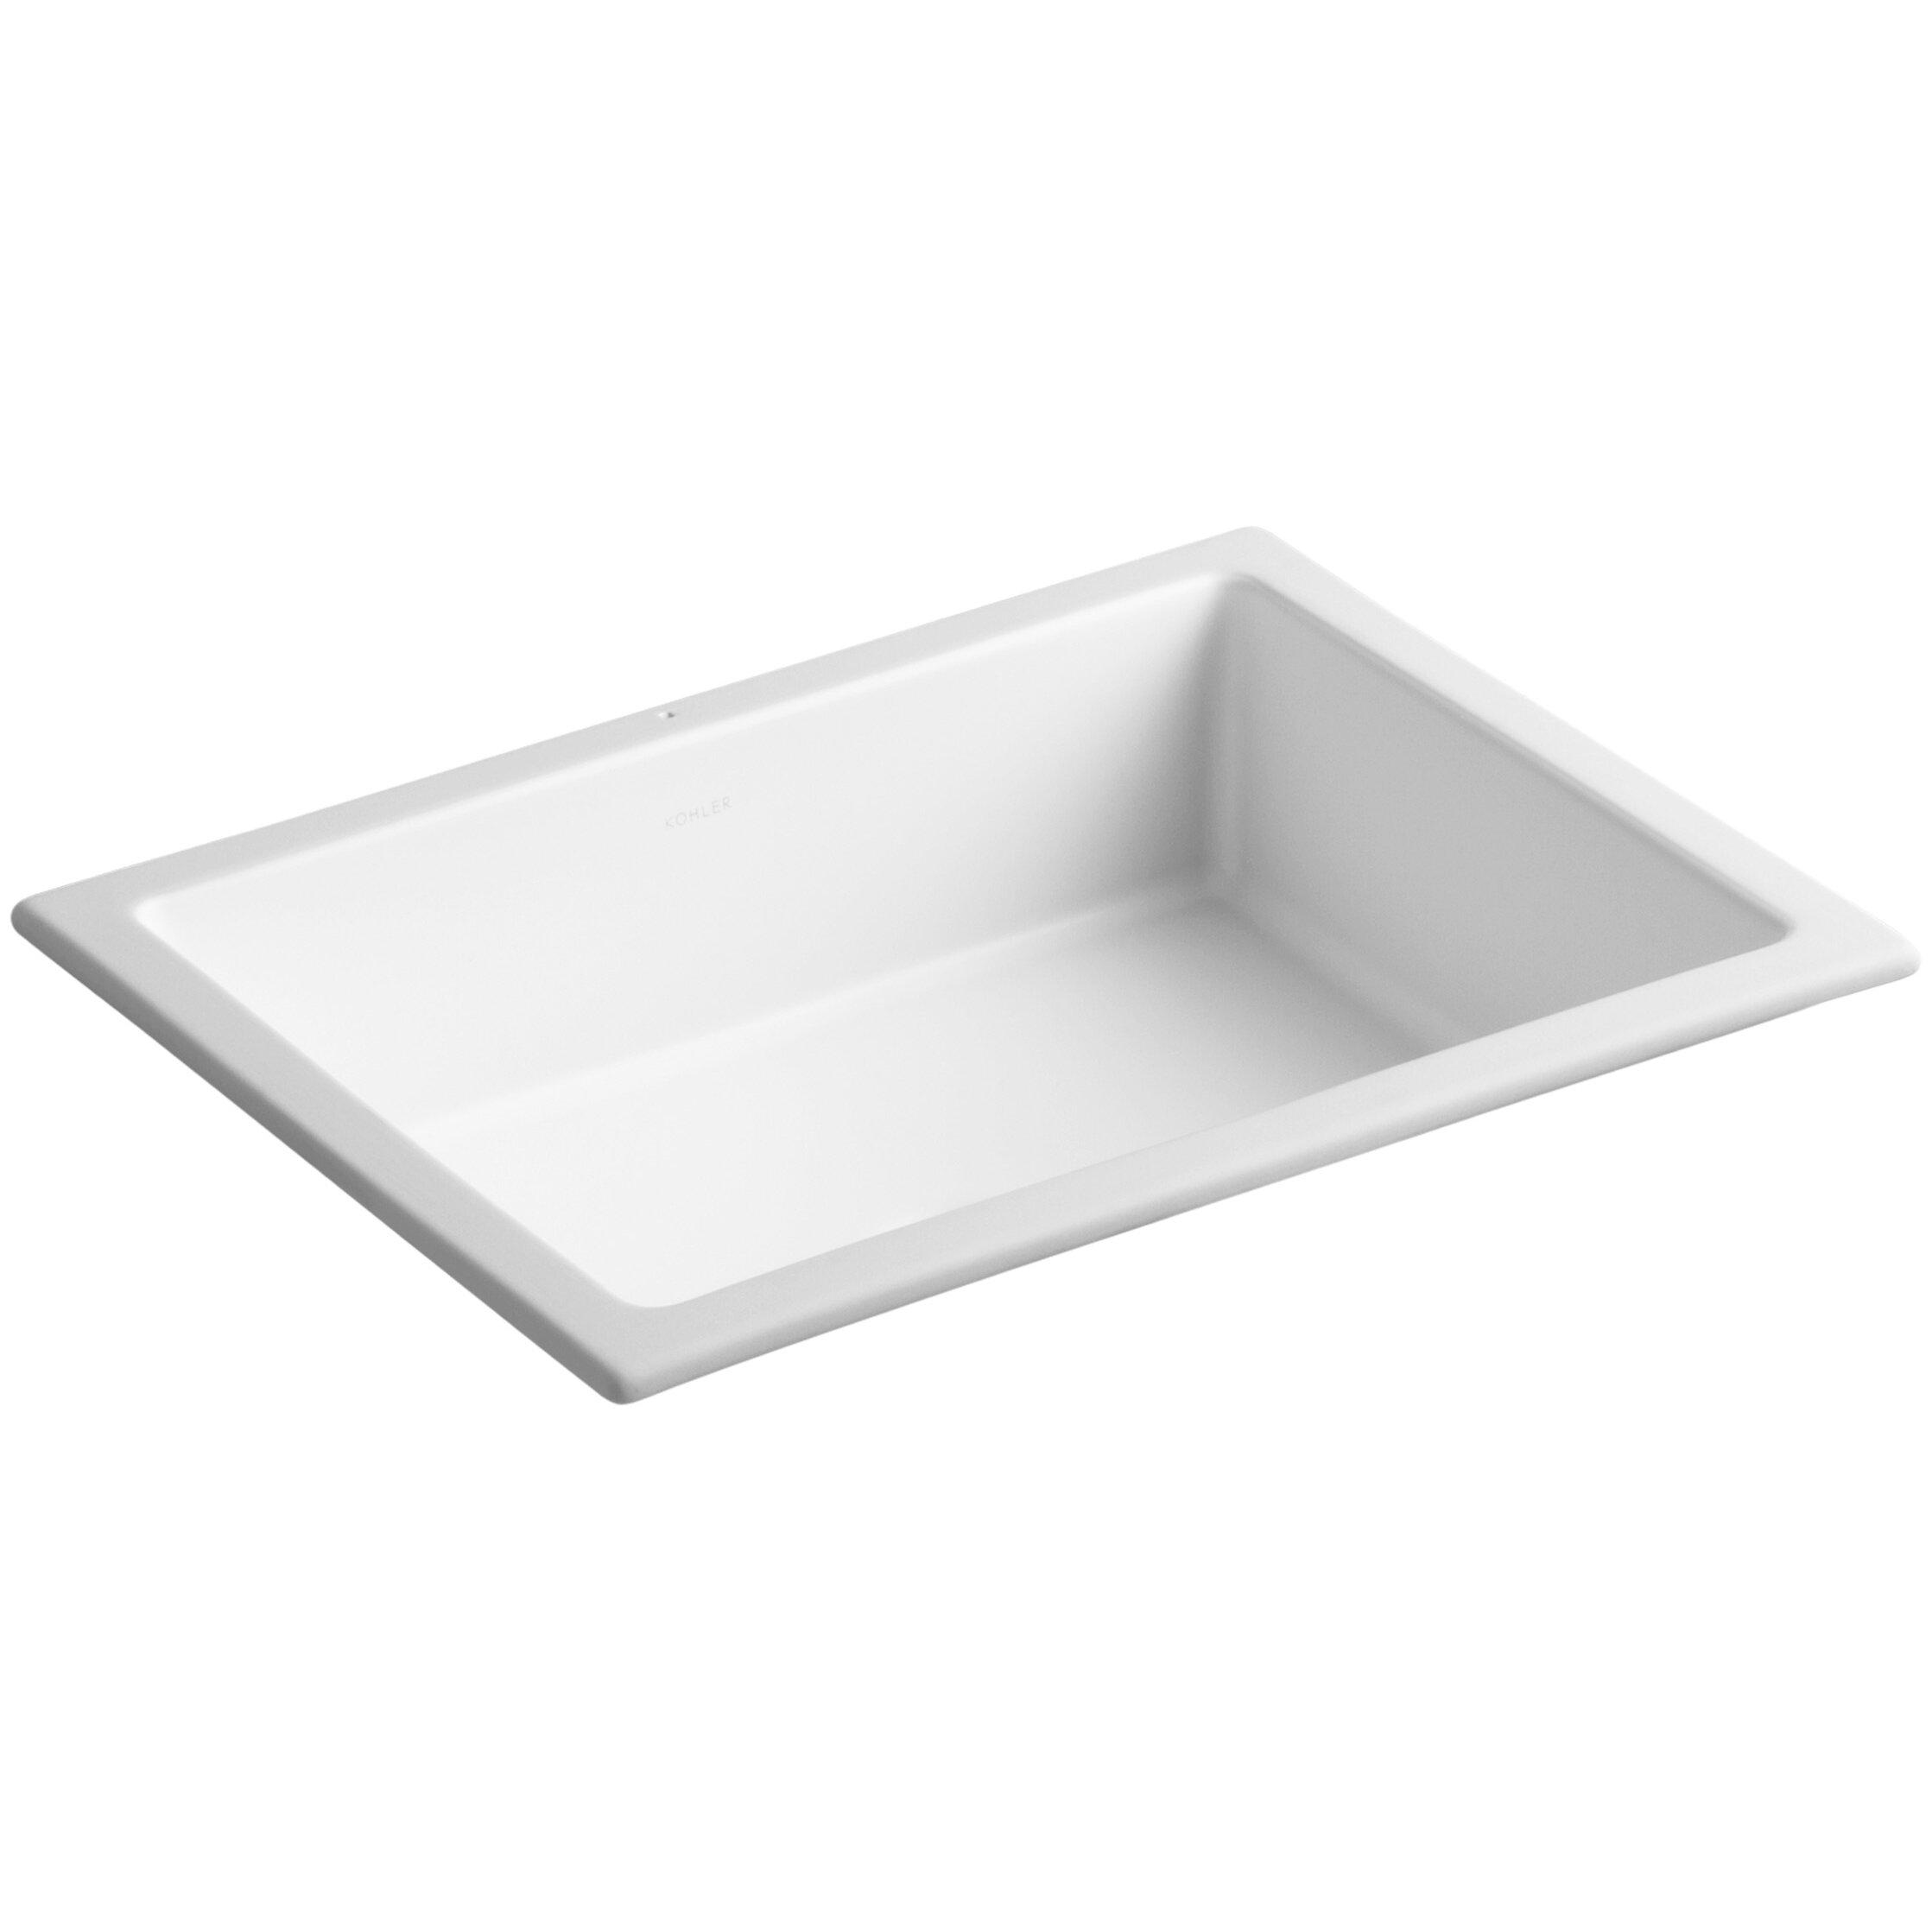 Kohler Sink Protectors : ... Improvement Bathroom Fixtures ... Kohler Part #: K-2882 SKU: KOH13727